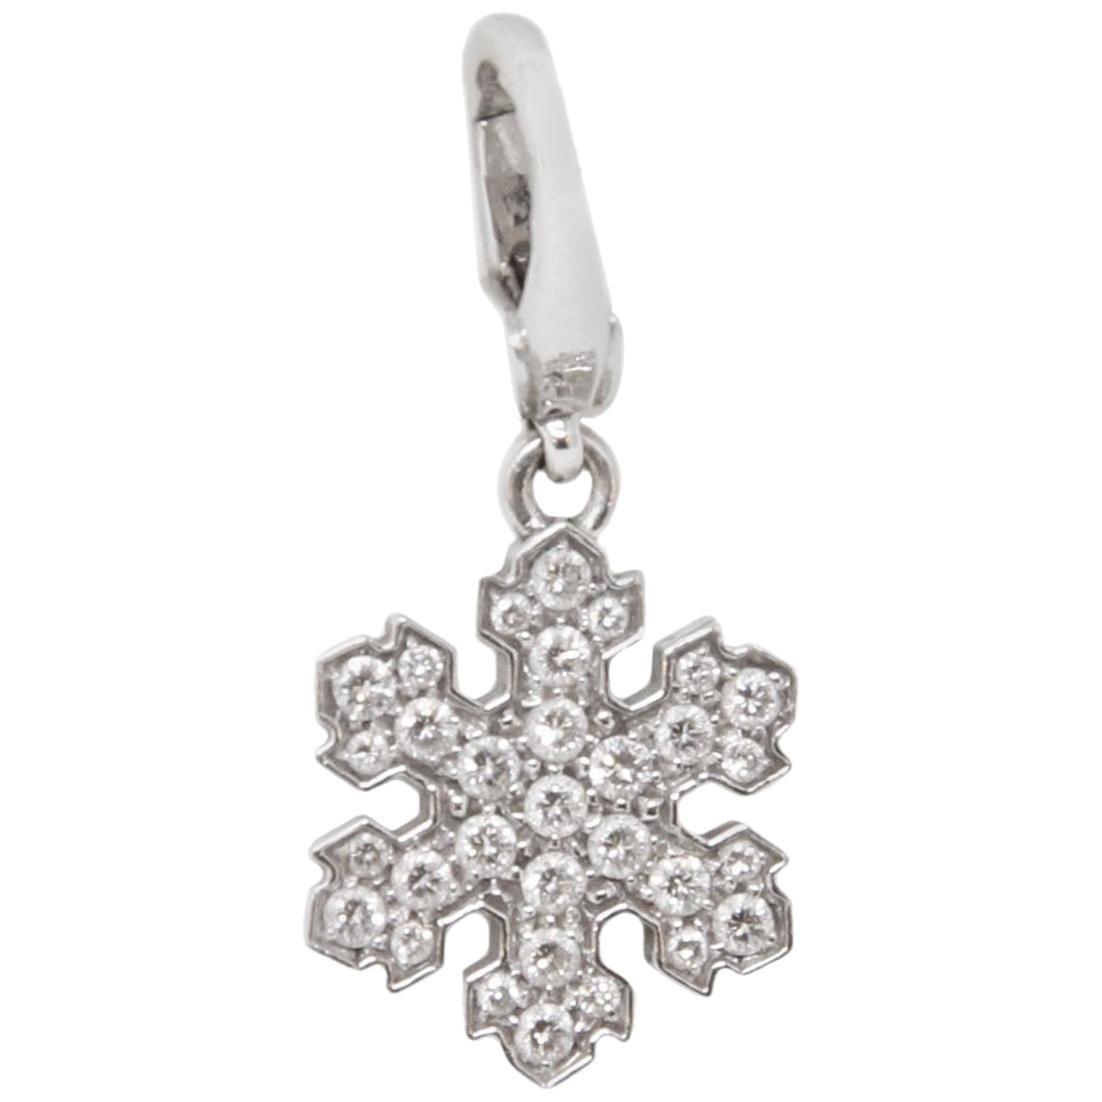 Bvlgari 18 Karat White Gold Snowflake Pendant Charm